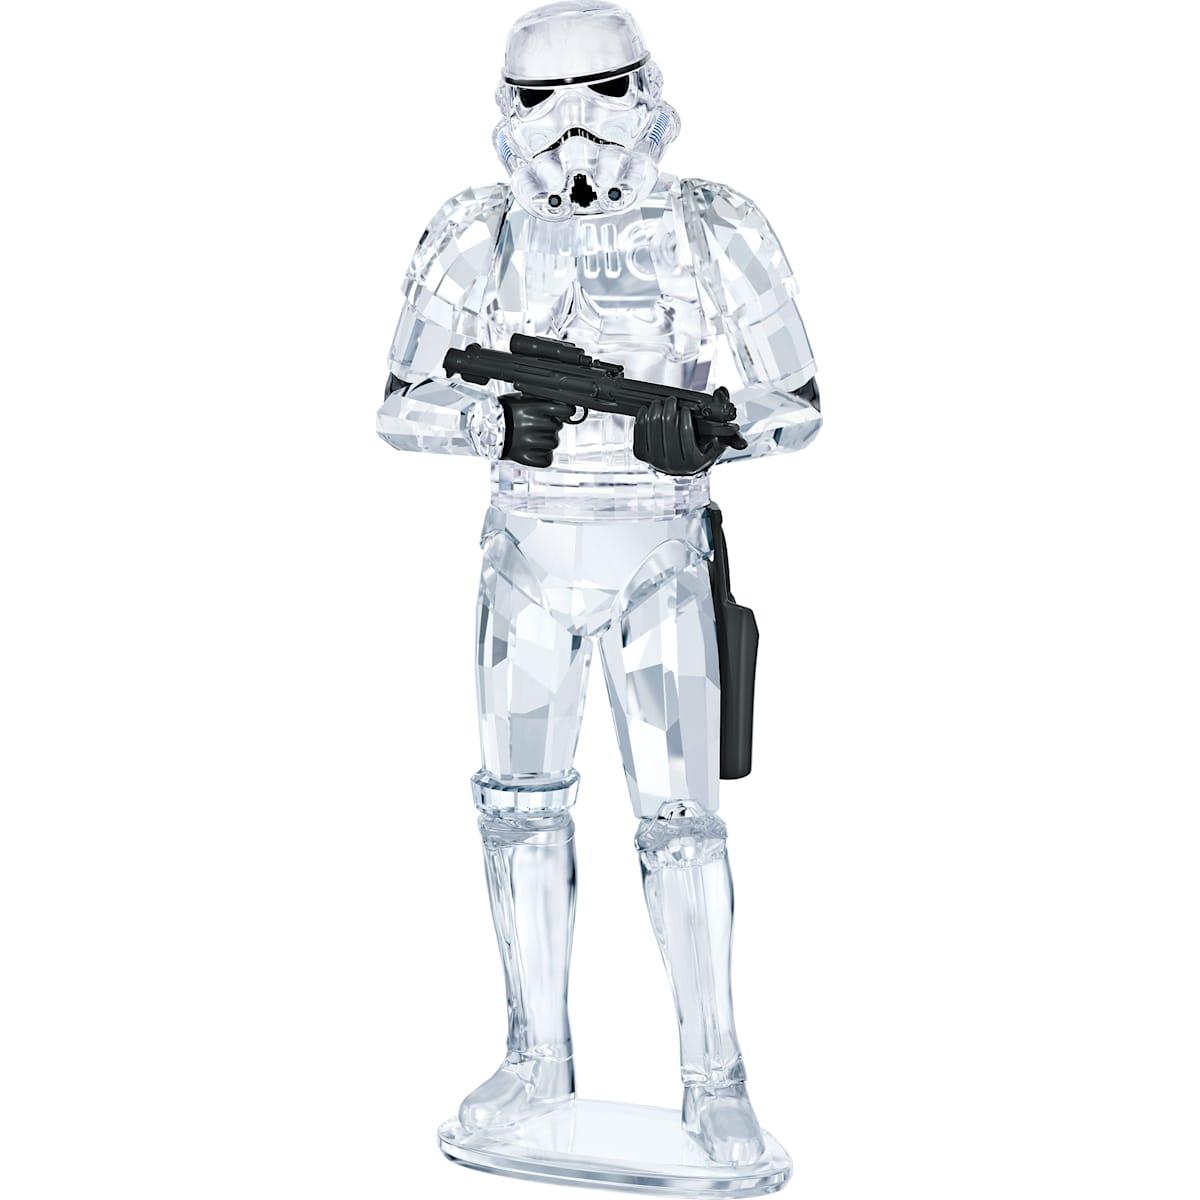 Star Wars – Stormtrooper